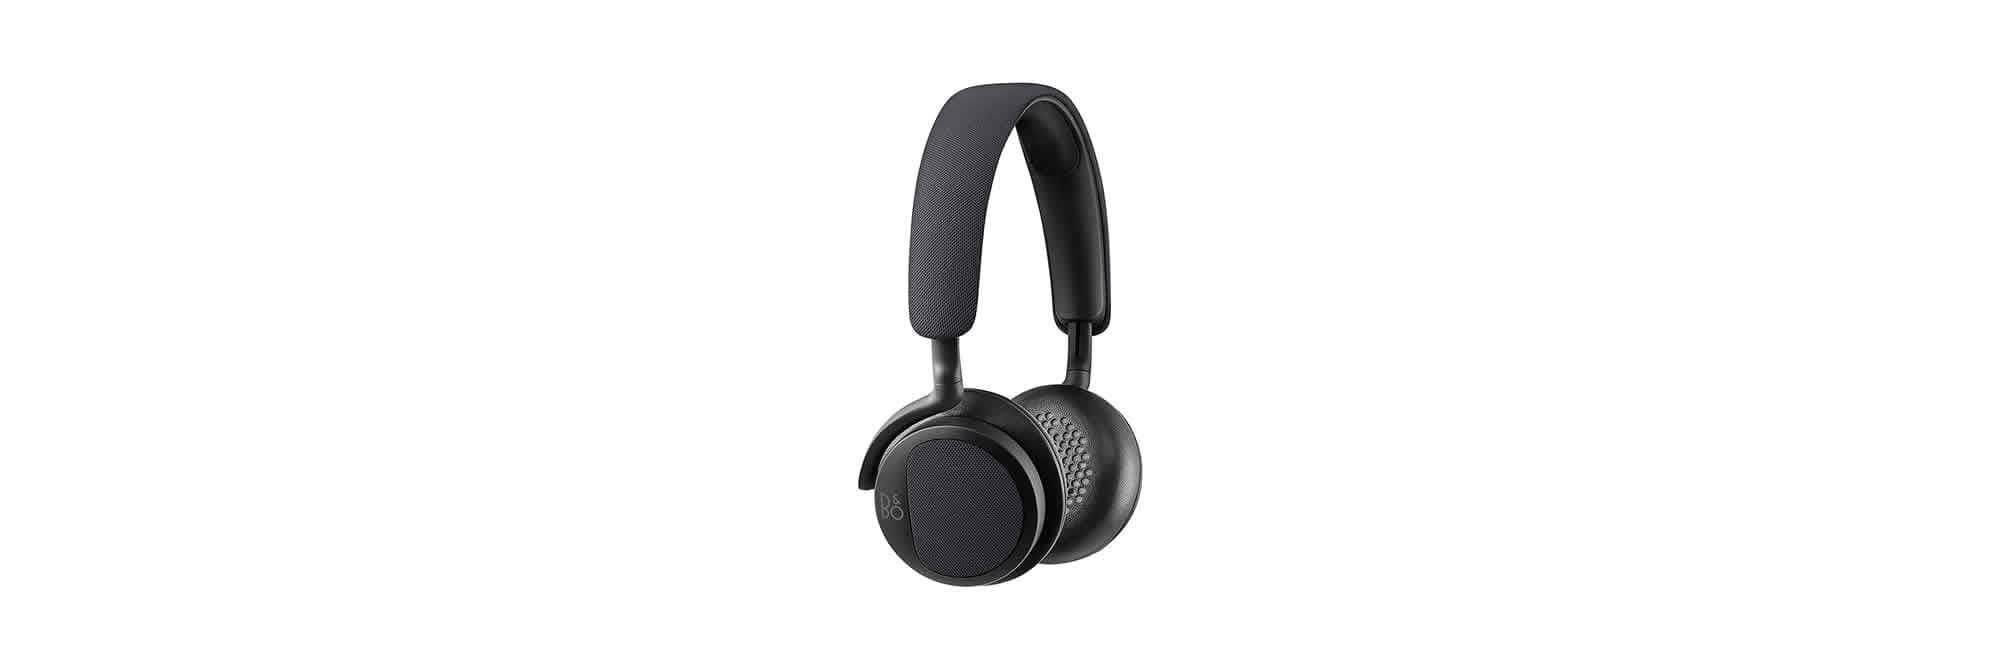 On-Ear Headphones Quiz